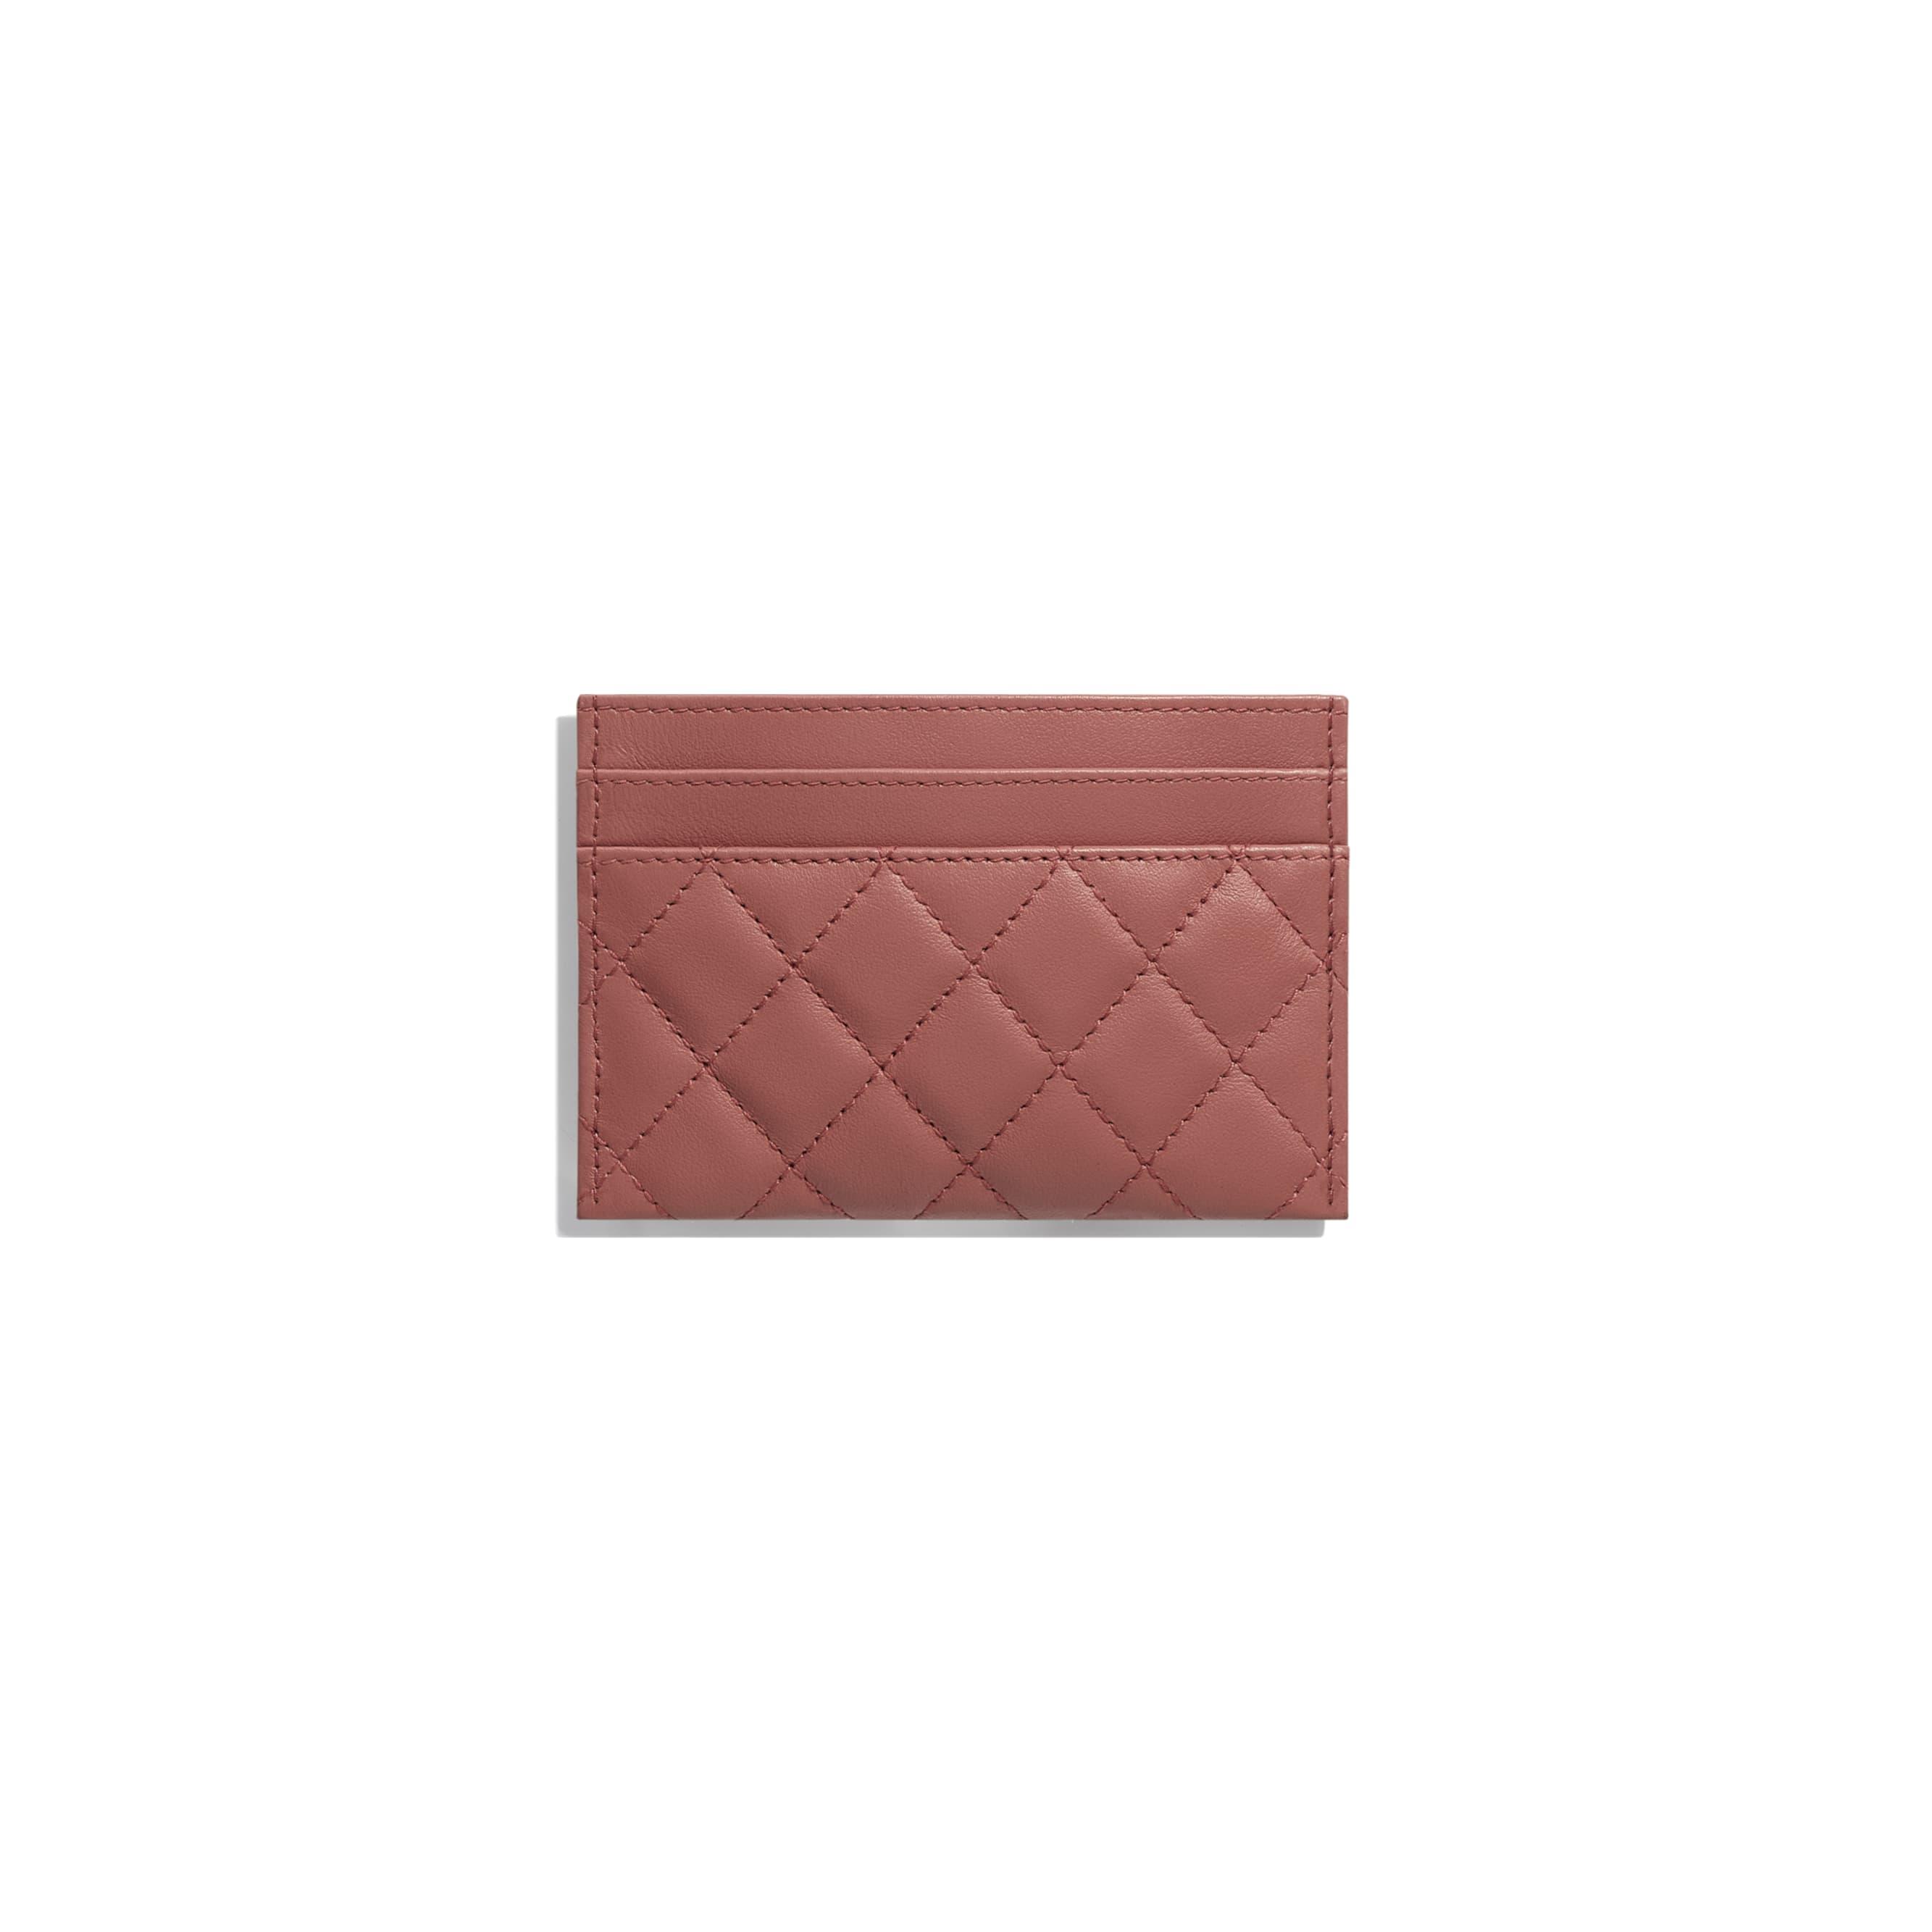 BOY CHANEL Card Holder - Dark Red - Calfskin & Gold-Tone Metal - Alternative view - see standard sized version